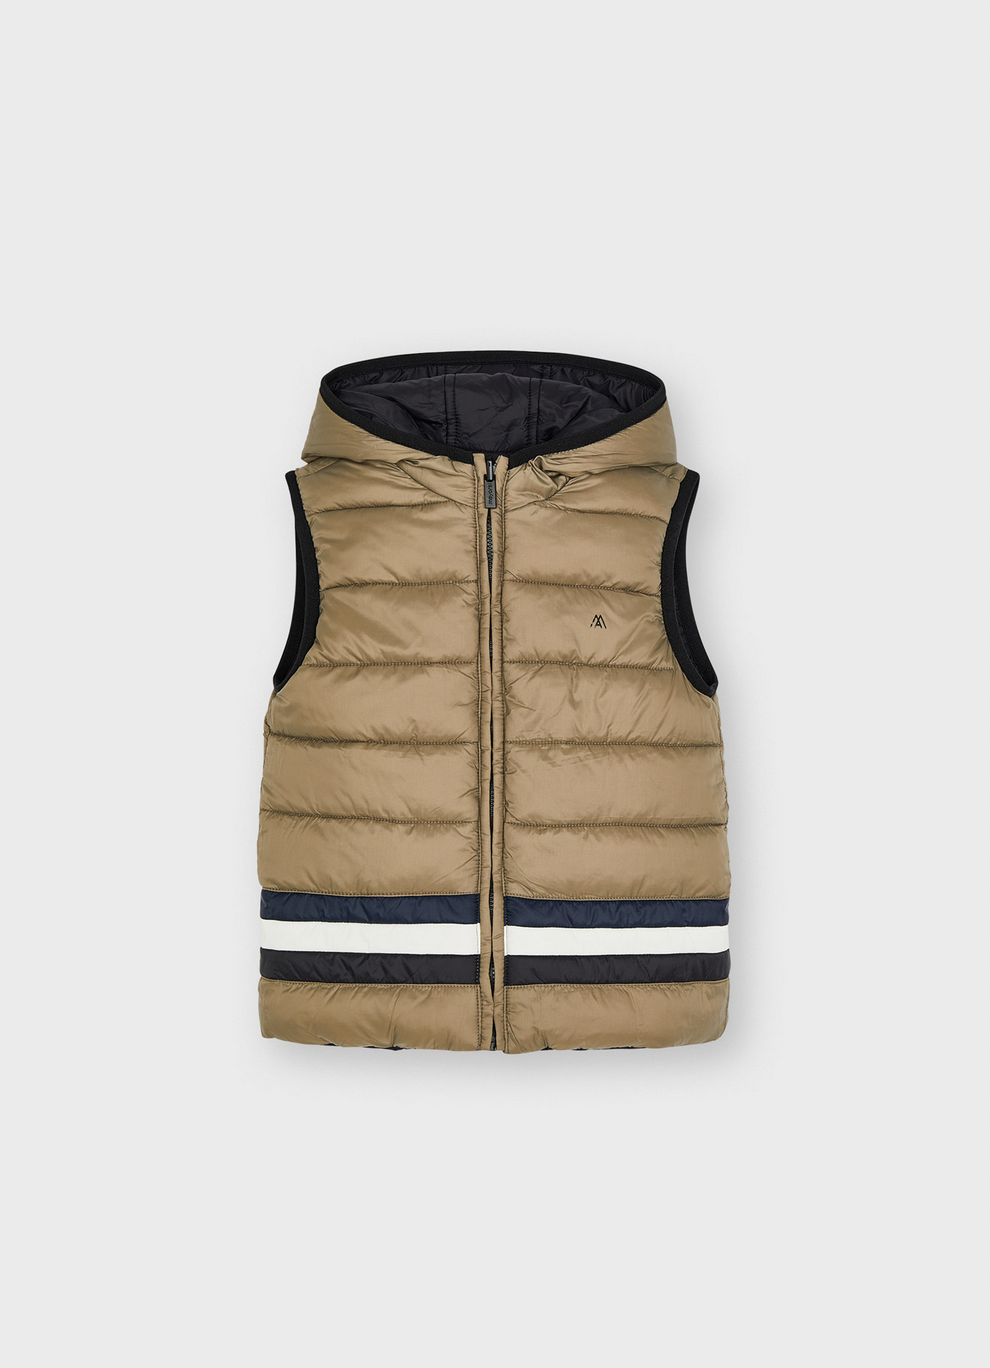 Mayoral 4365 48 Reversible Vest, Mole